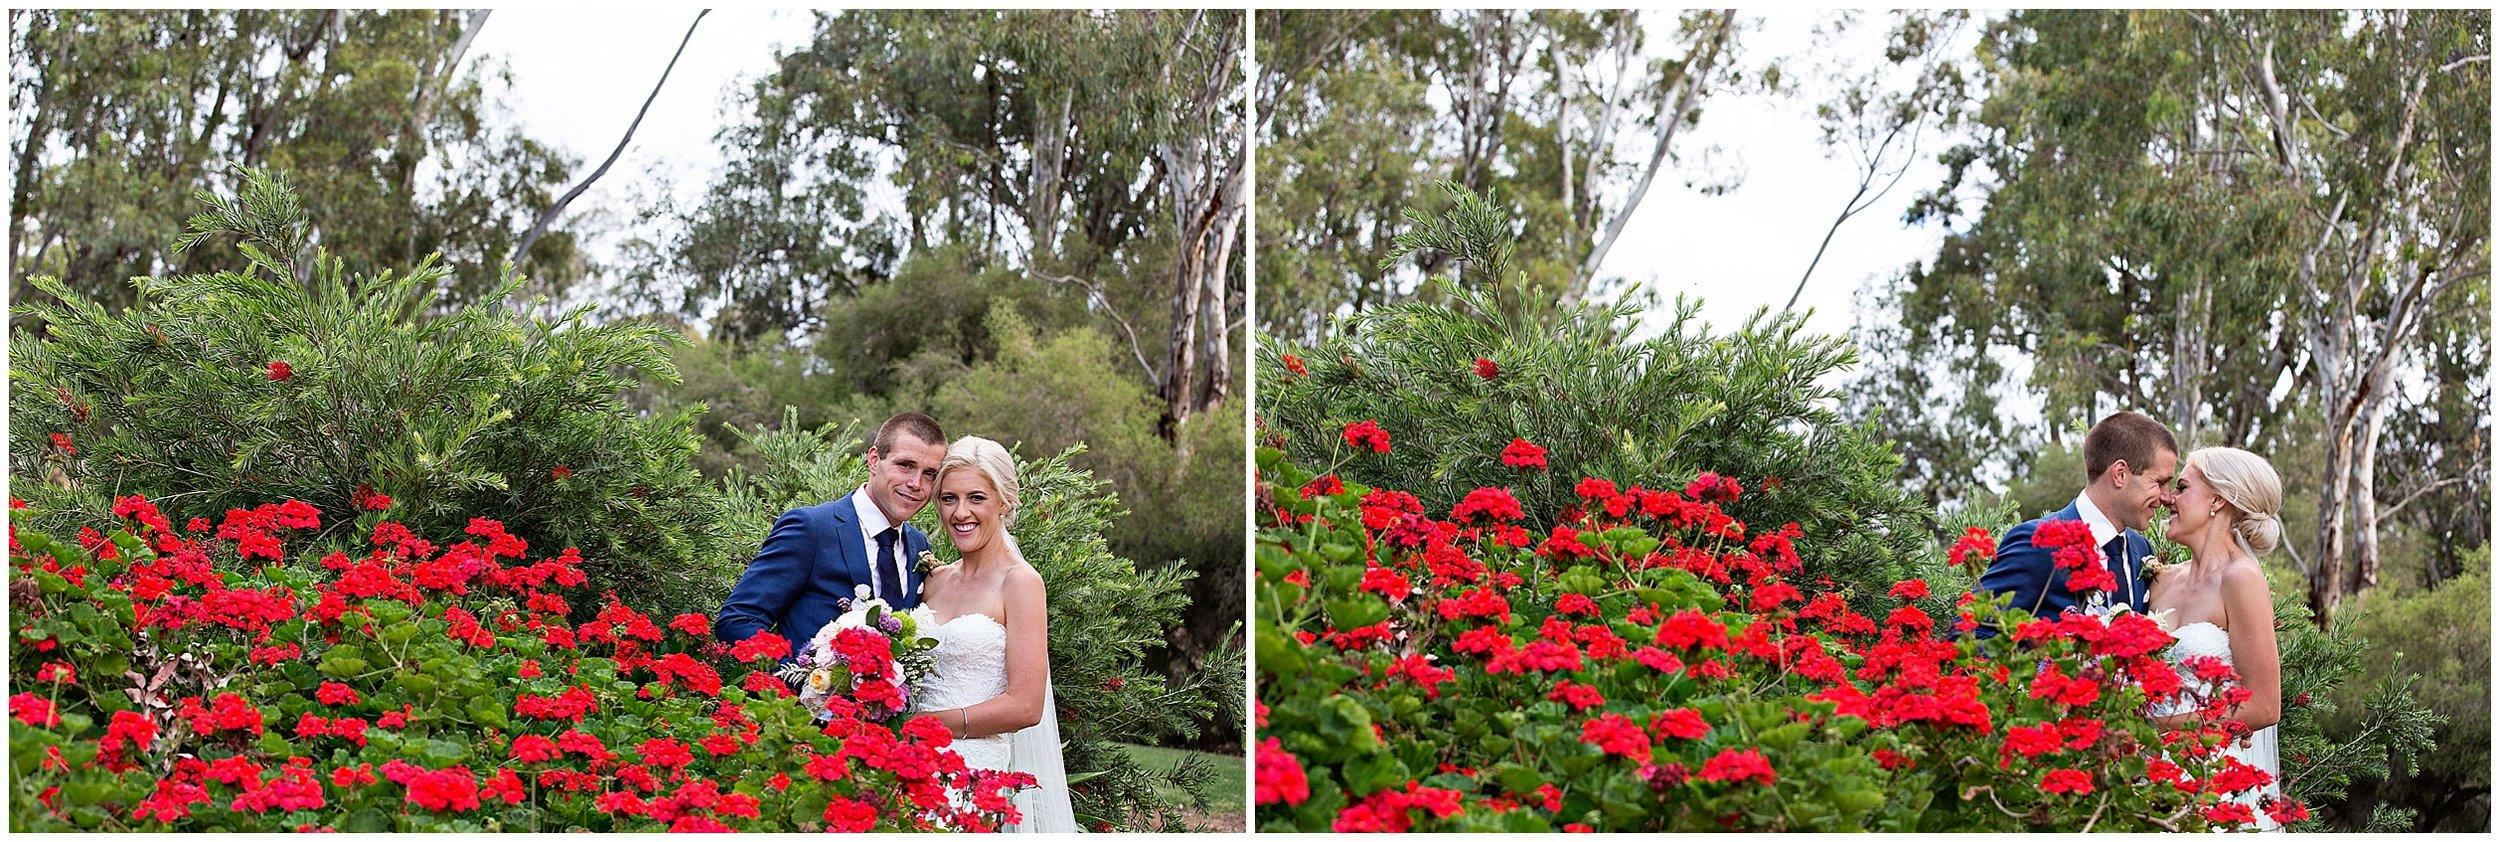 shepparton-wedding-photographer_0119.jpg